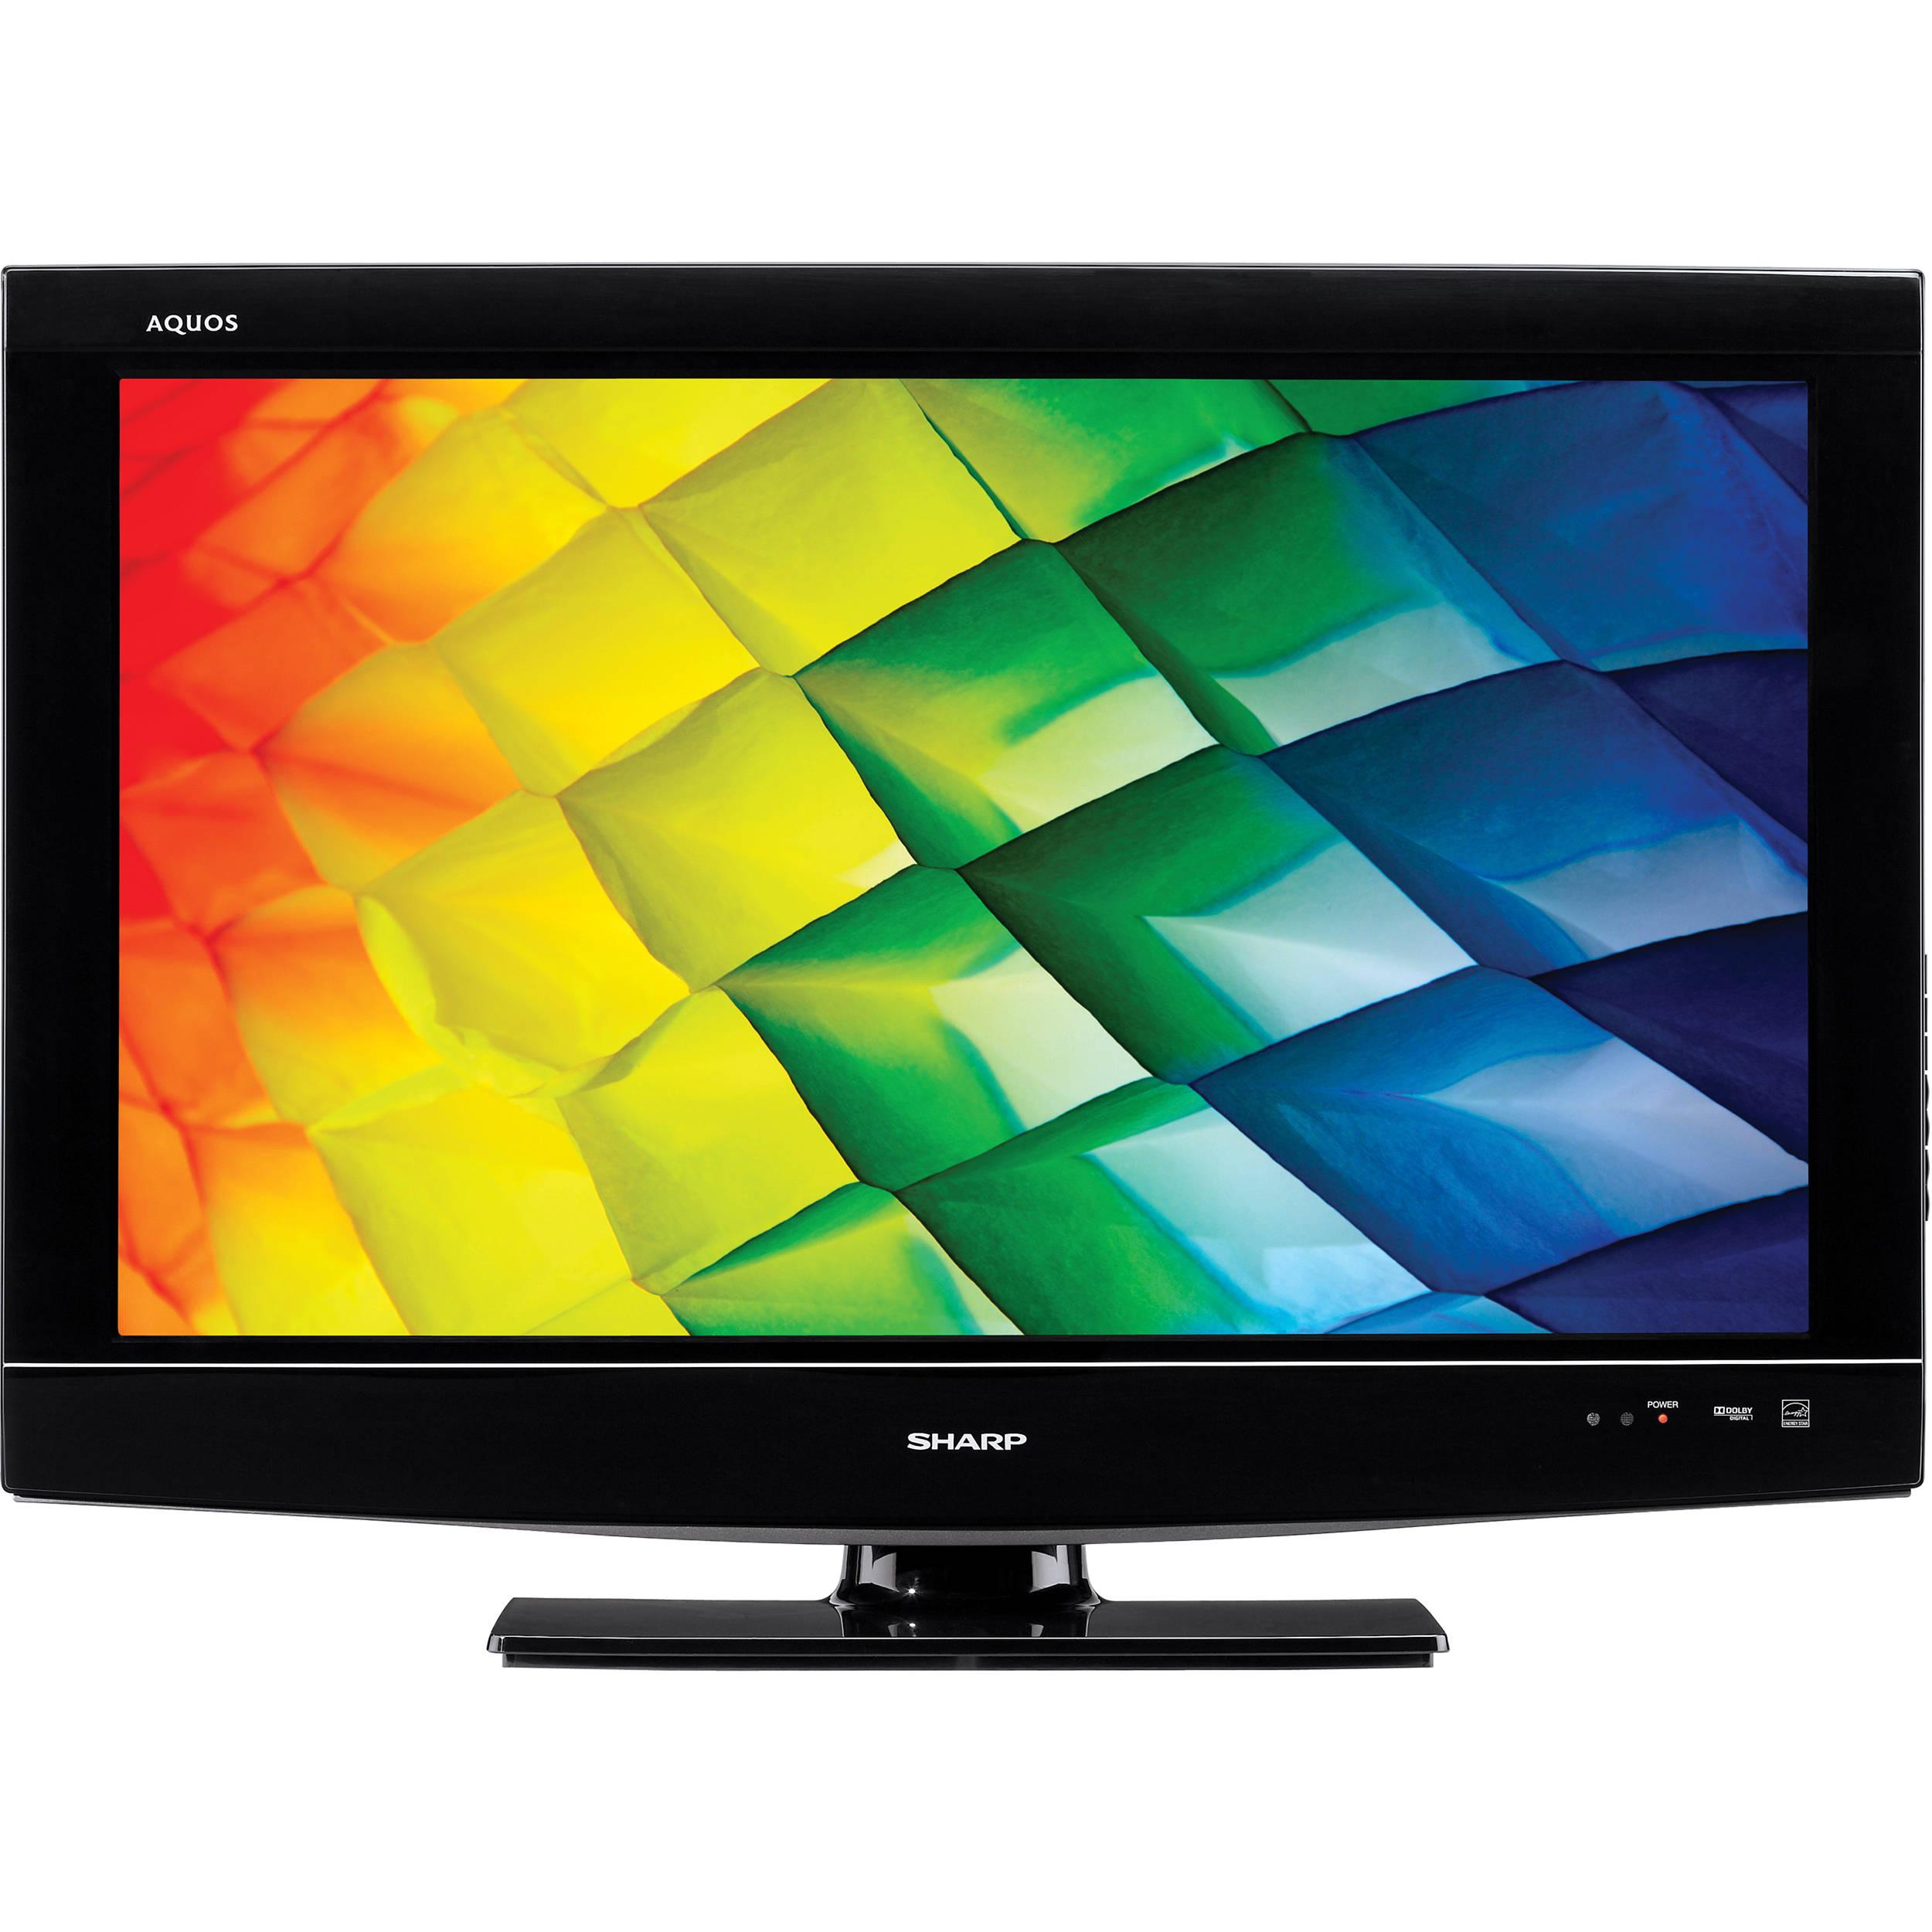 sharp lc32d47ua 32 720p lcd tv lc32d47ua b h photo video rh bhphotovideo com